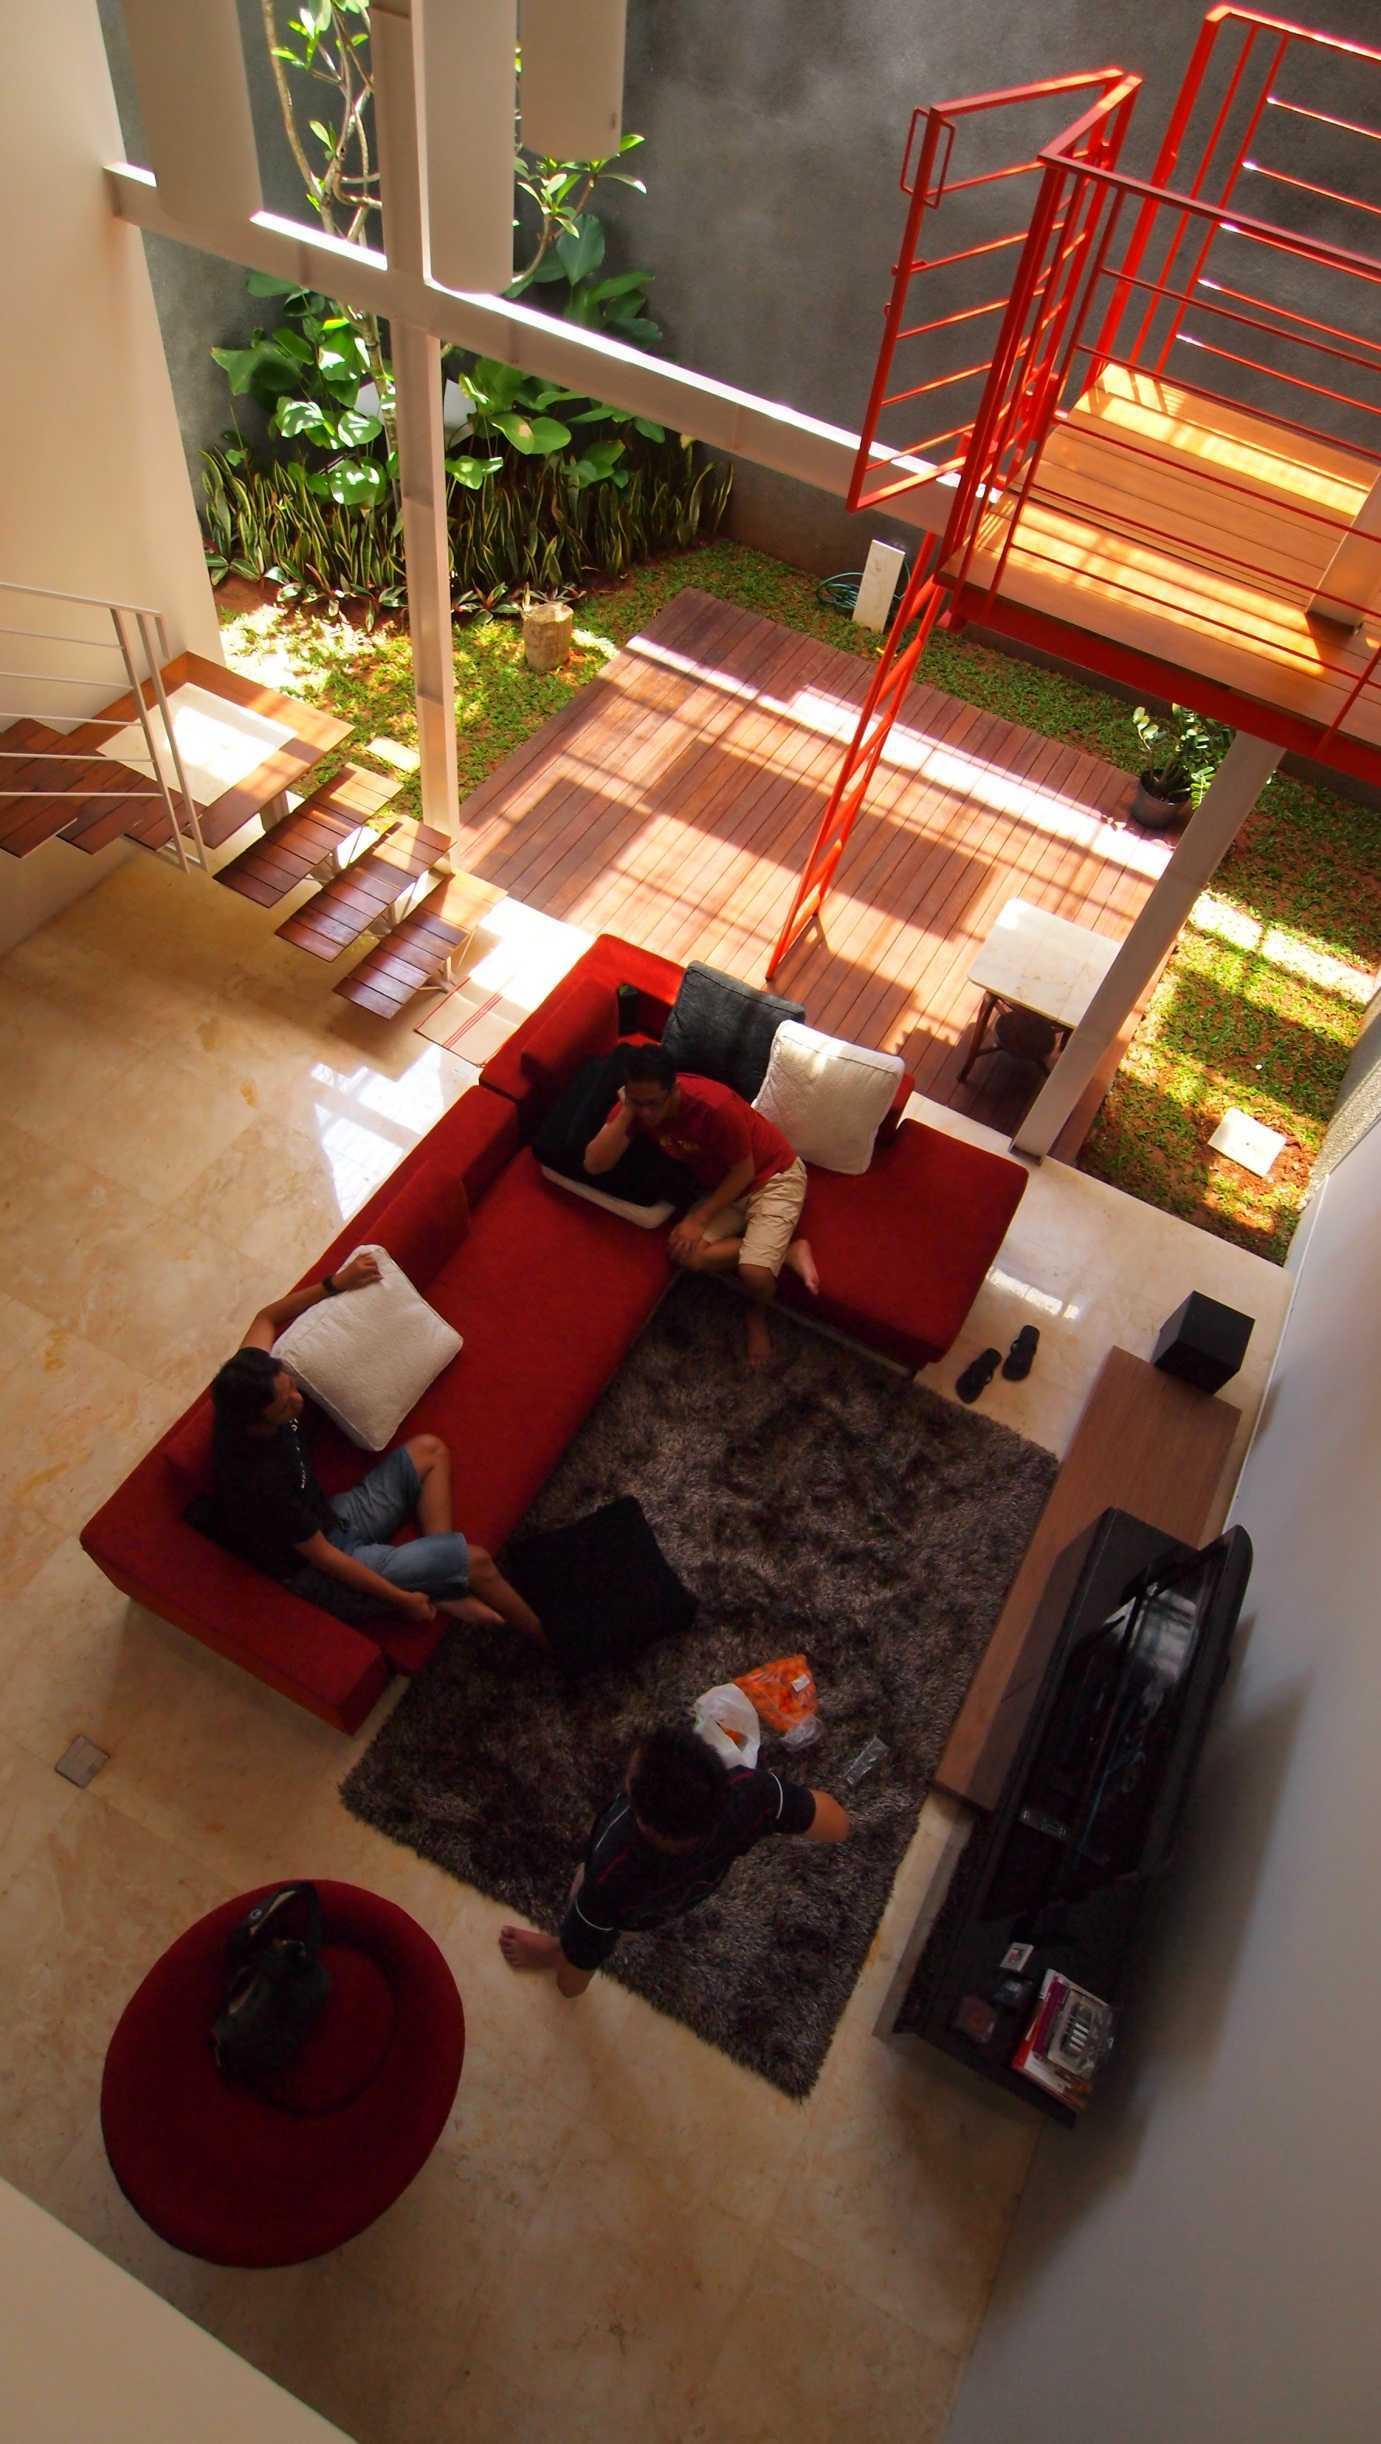 Studio Sa_E Cage House Jakarta, Daerah Khusus Ibukota Jakarta, Indonesia Jakarta, Daerah Khusus Ibukota Jakarta, Indonesia Studio-Sae-Cage-House   52419